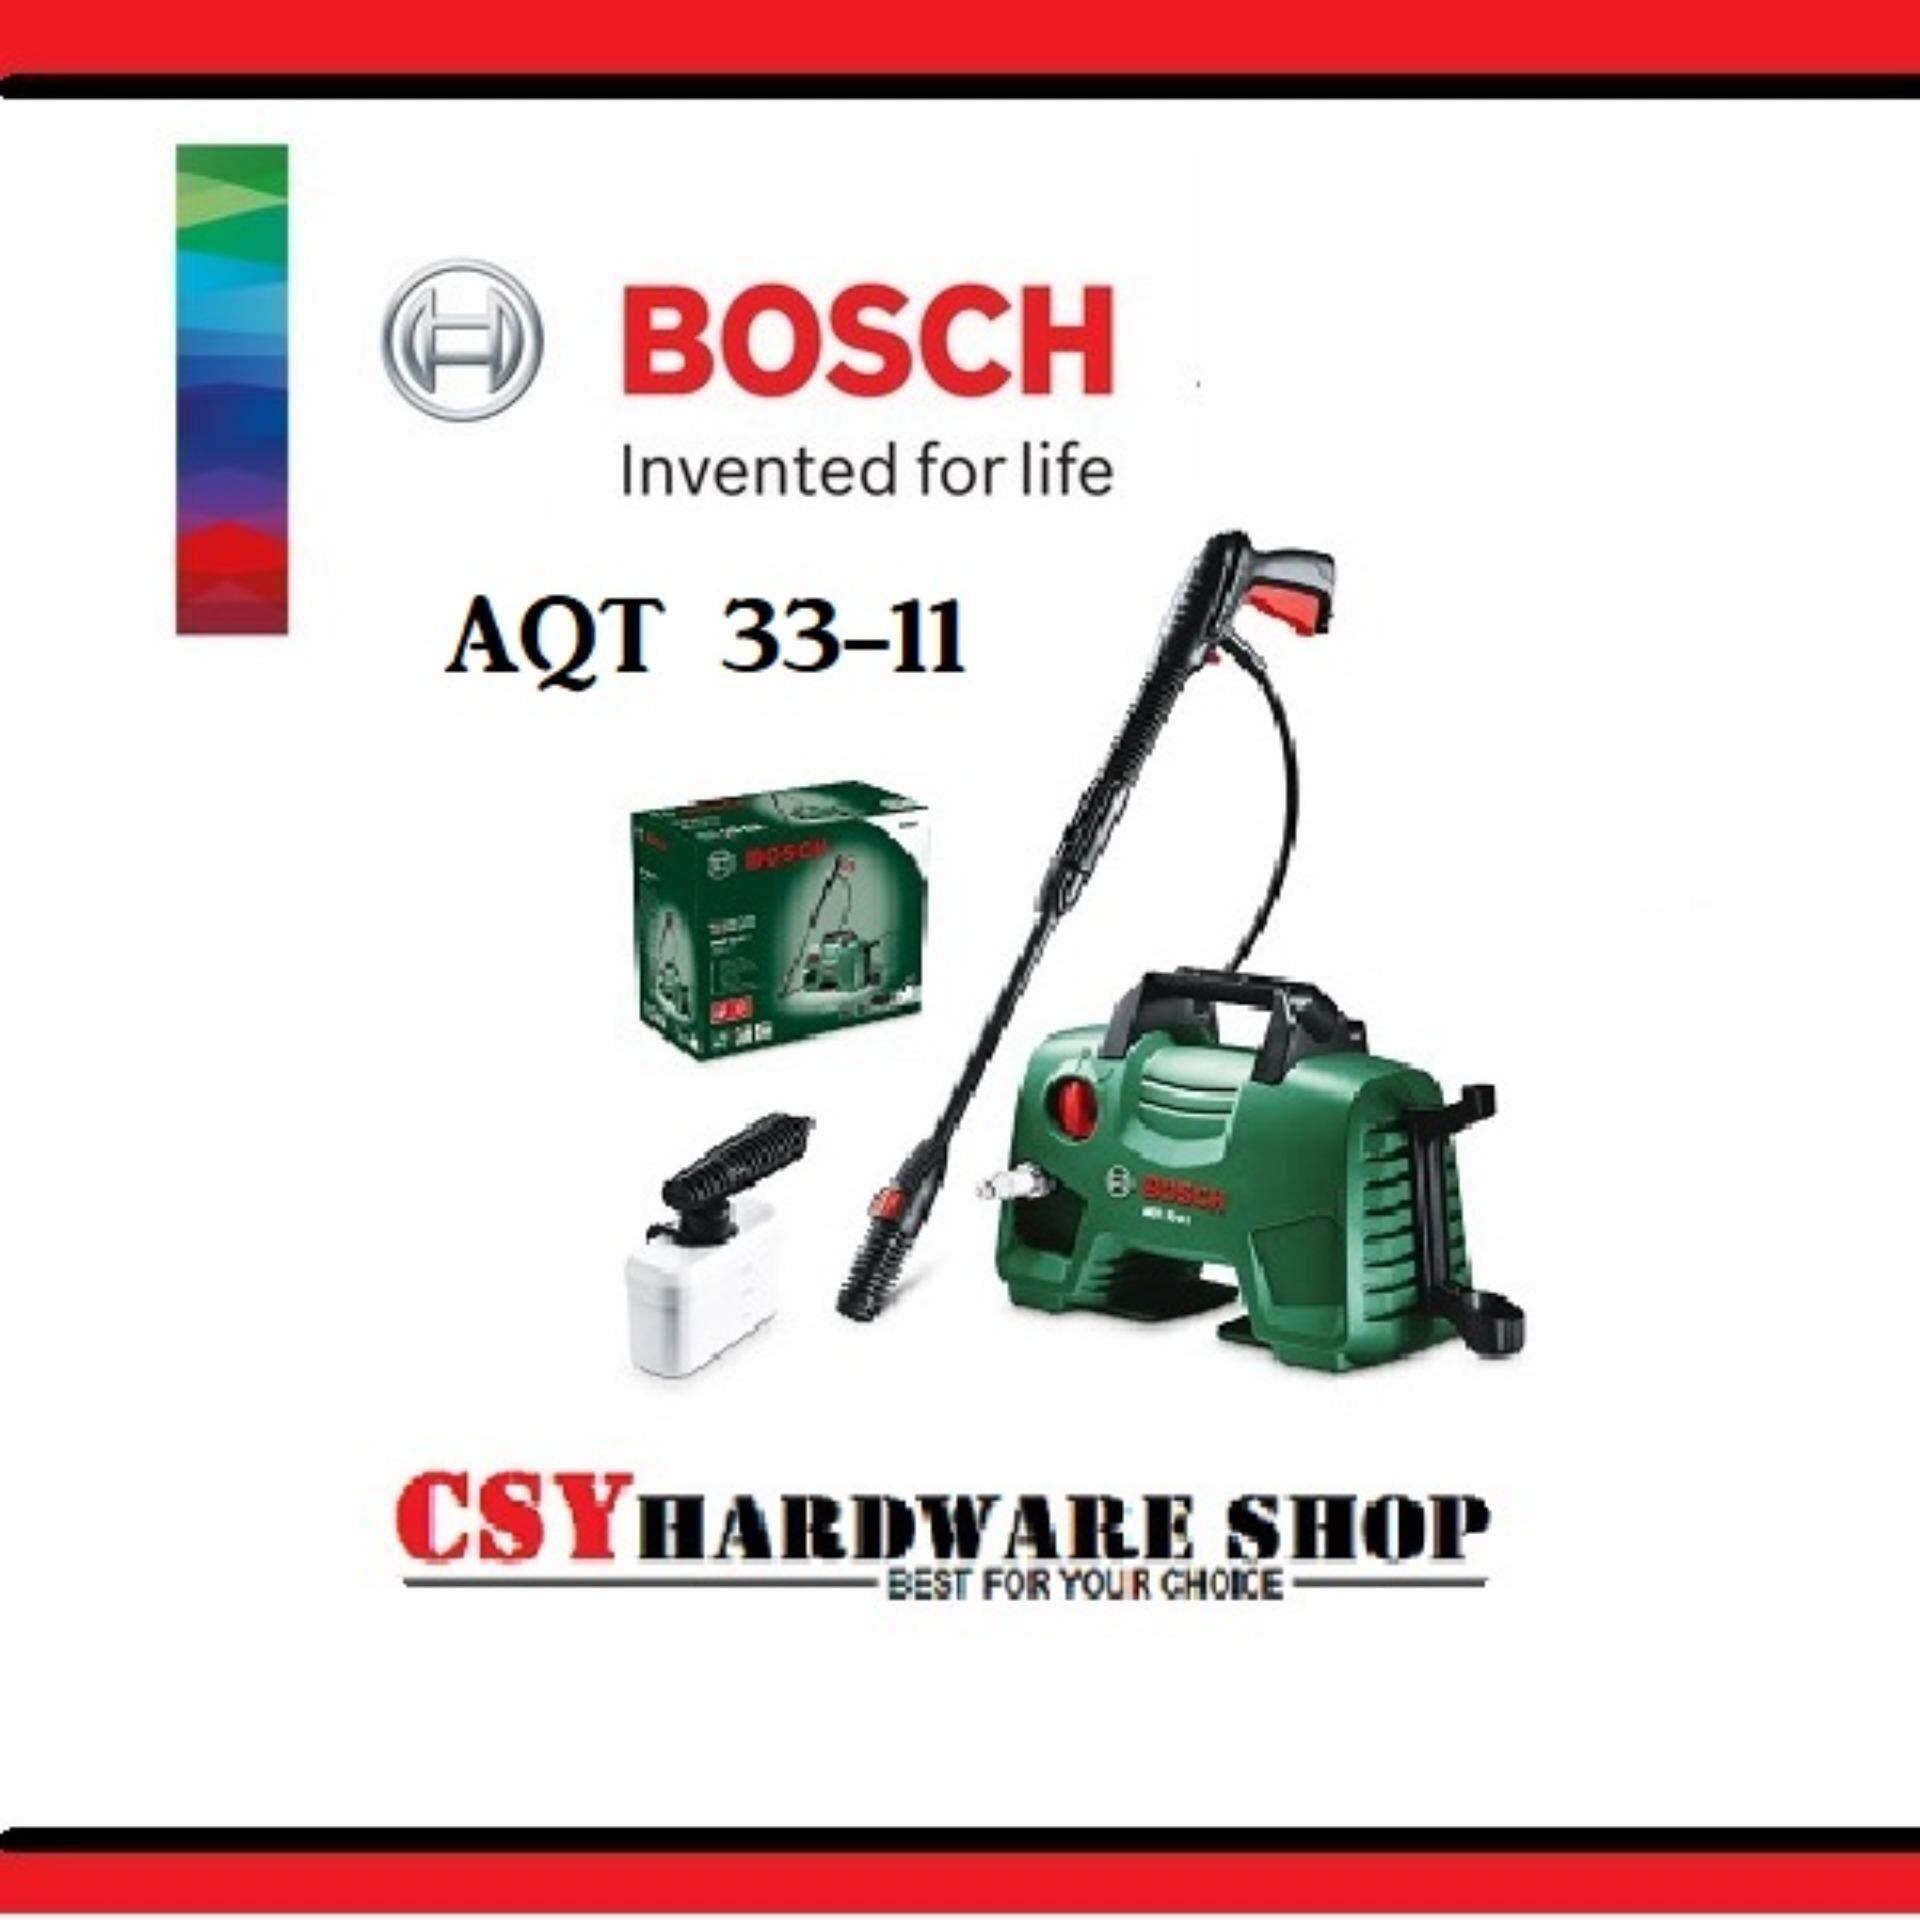 Sell Bosch Aqt 45 Cheapest Best Quality My Store High Pressure Washer Aquatak Aqt33 11 Myr 370 Power Tools 33